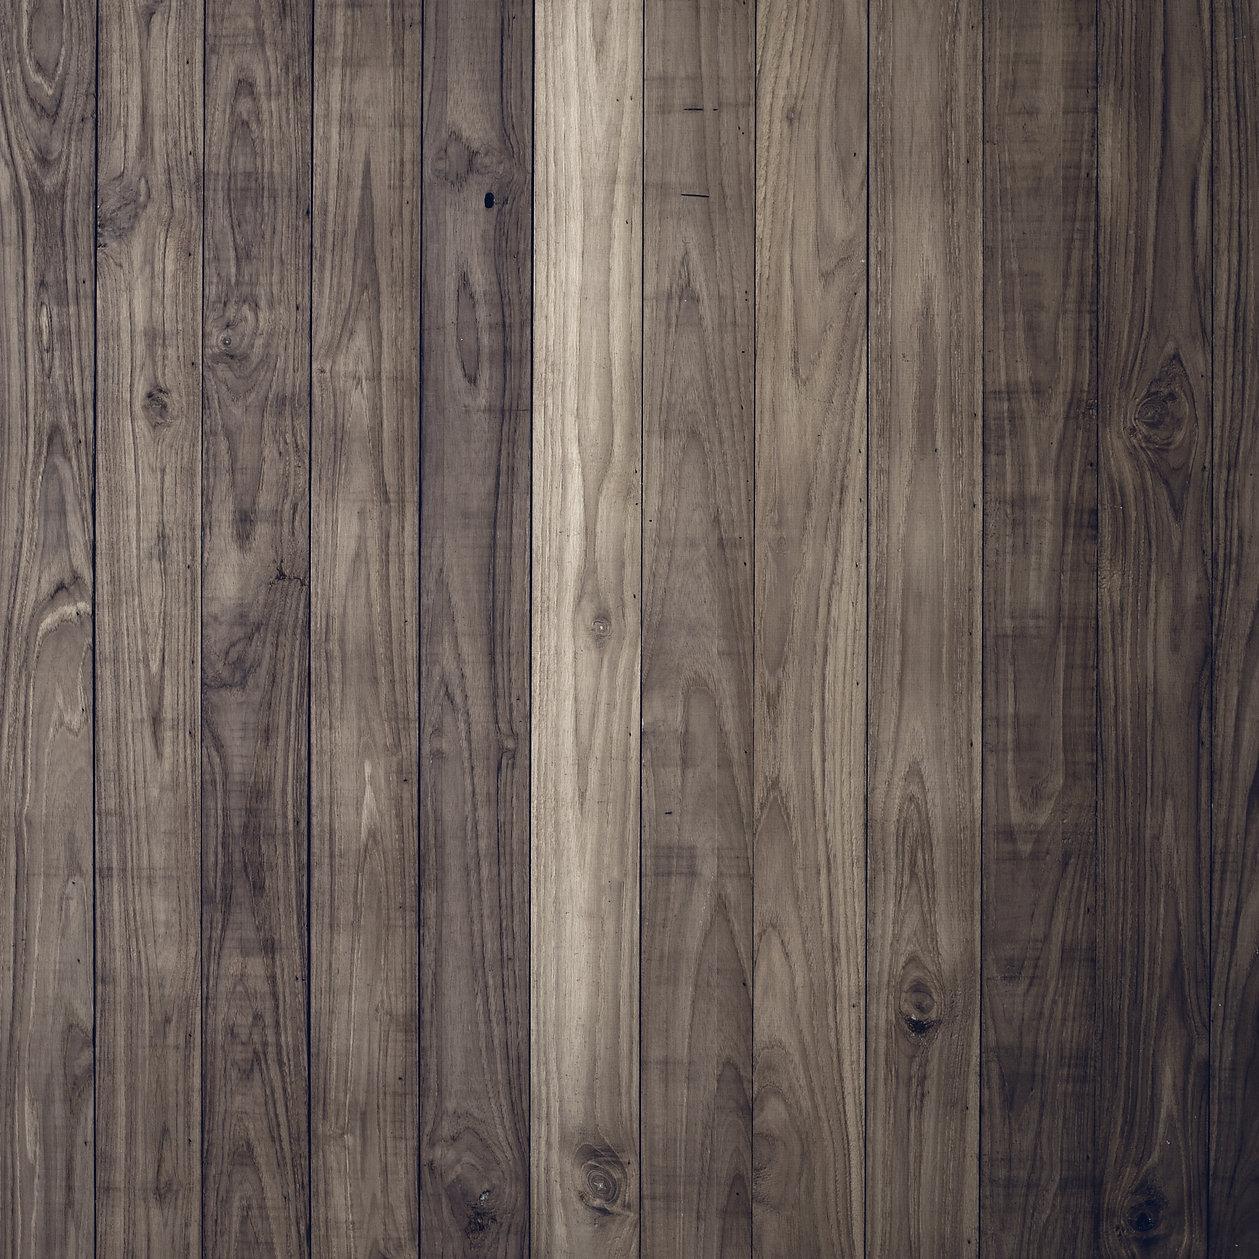 Dark Brown wood plank wall texture backg